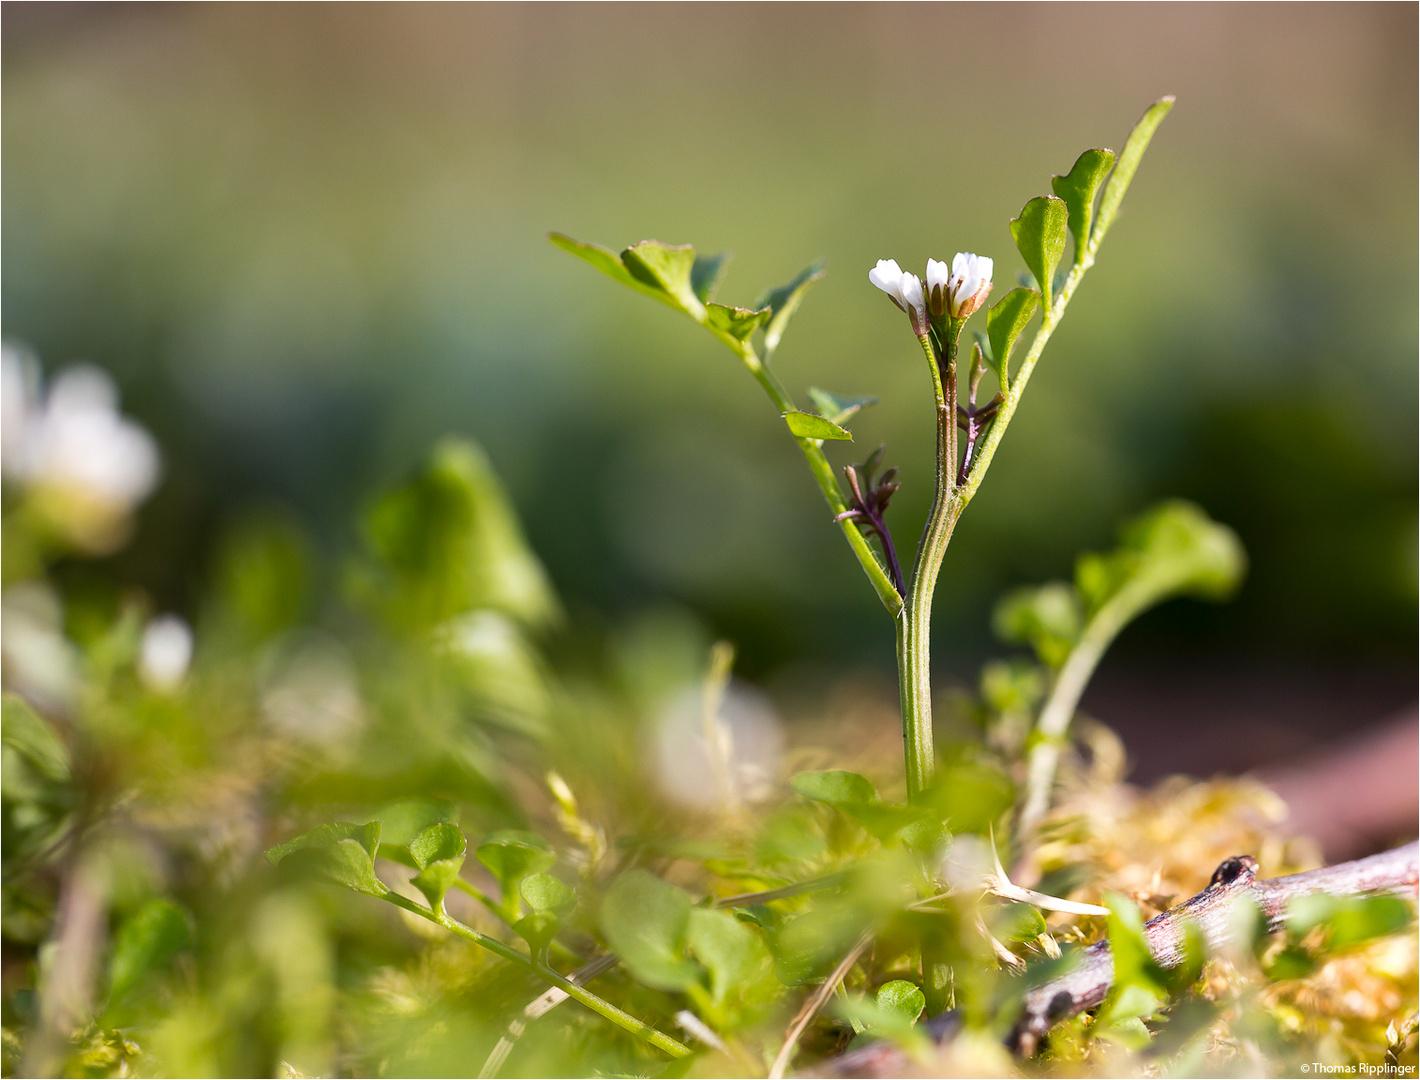 Vegetation am Boden....